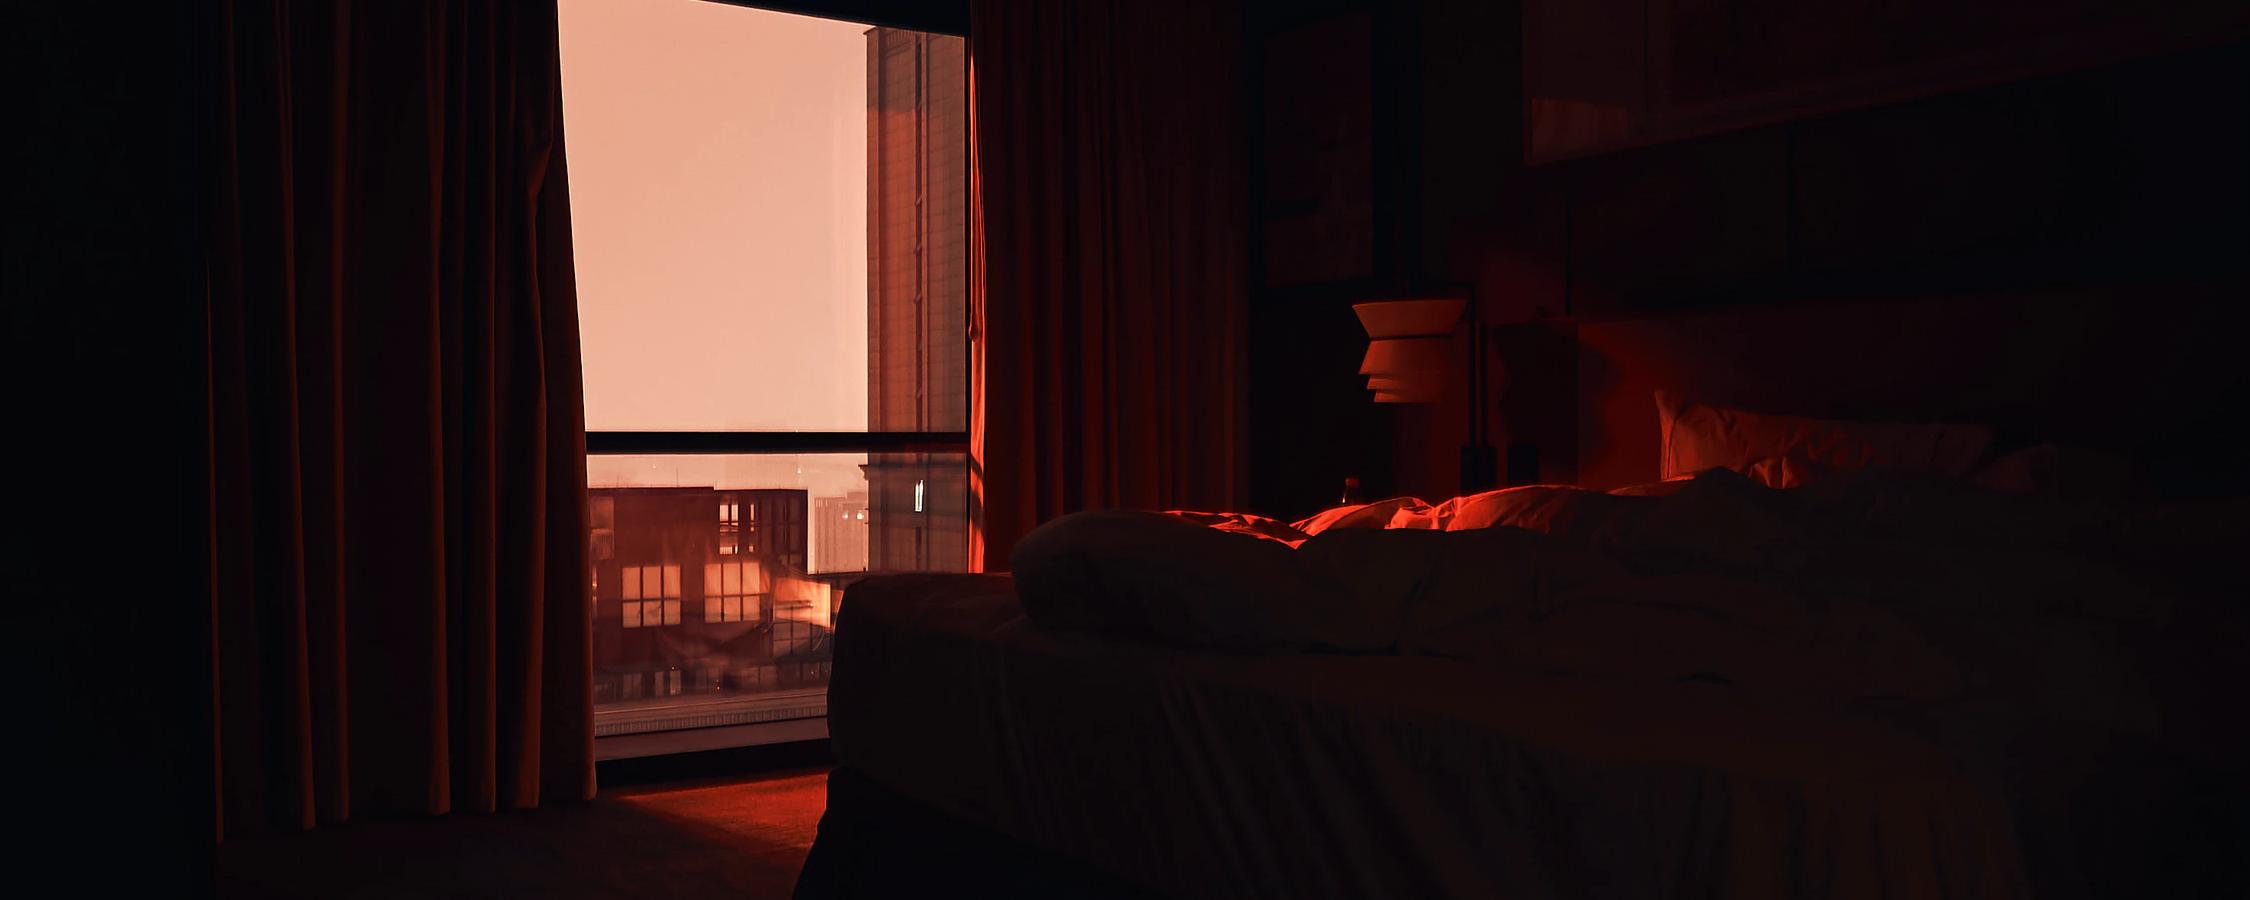 Sleep by Sepideh Jodeyri